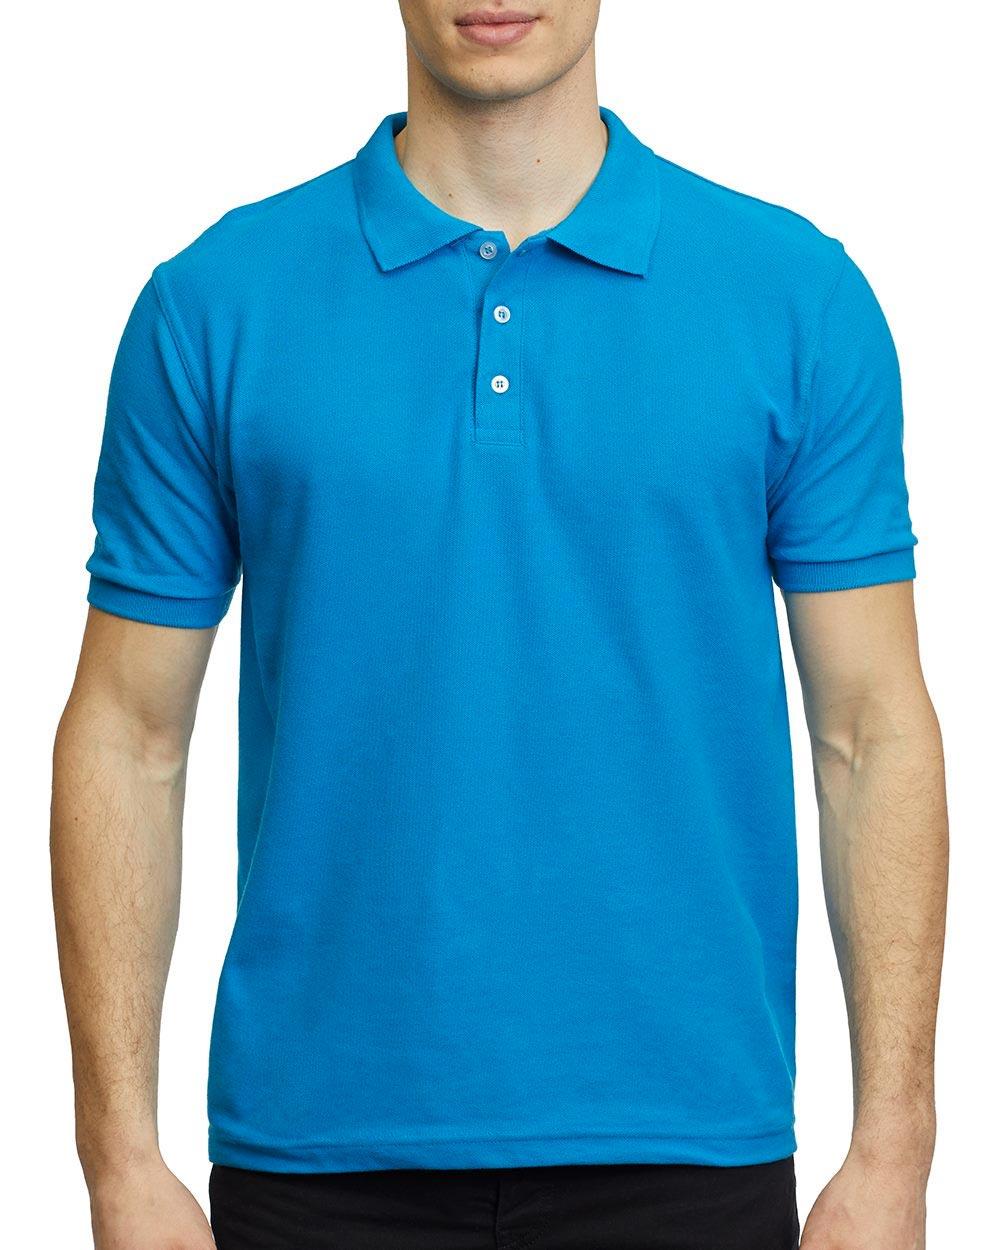 M&O Knits 7006 - Soft Touch Sport Shirt